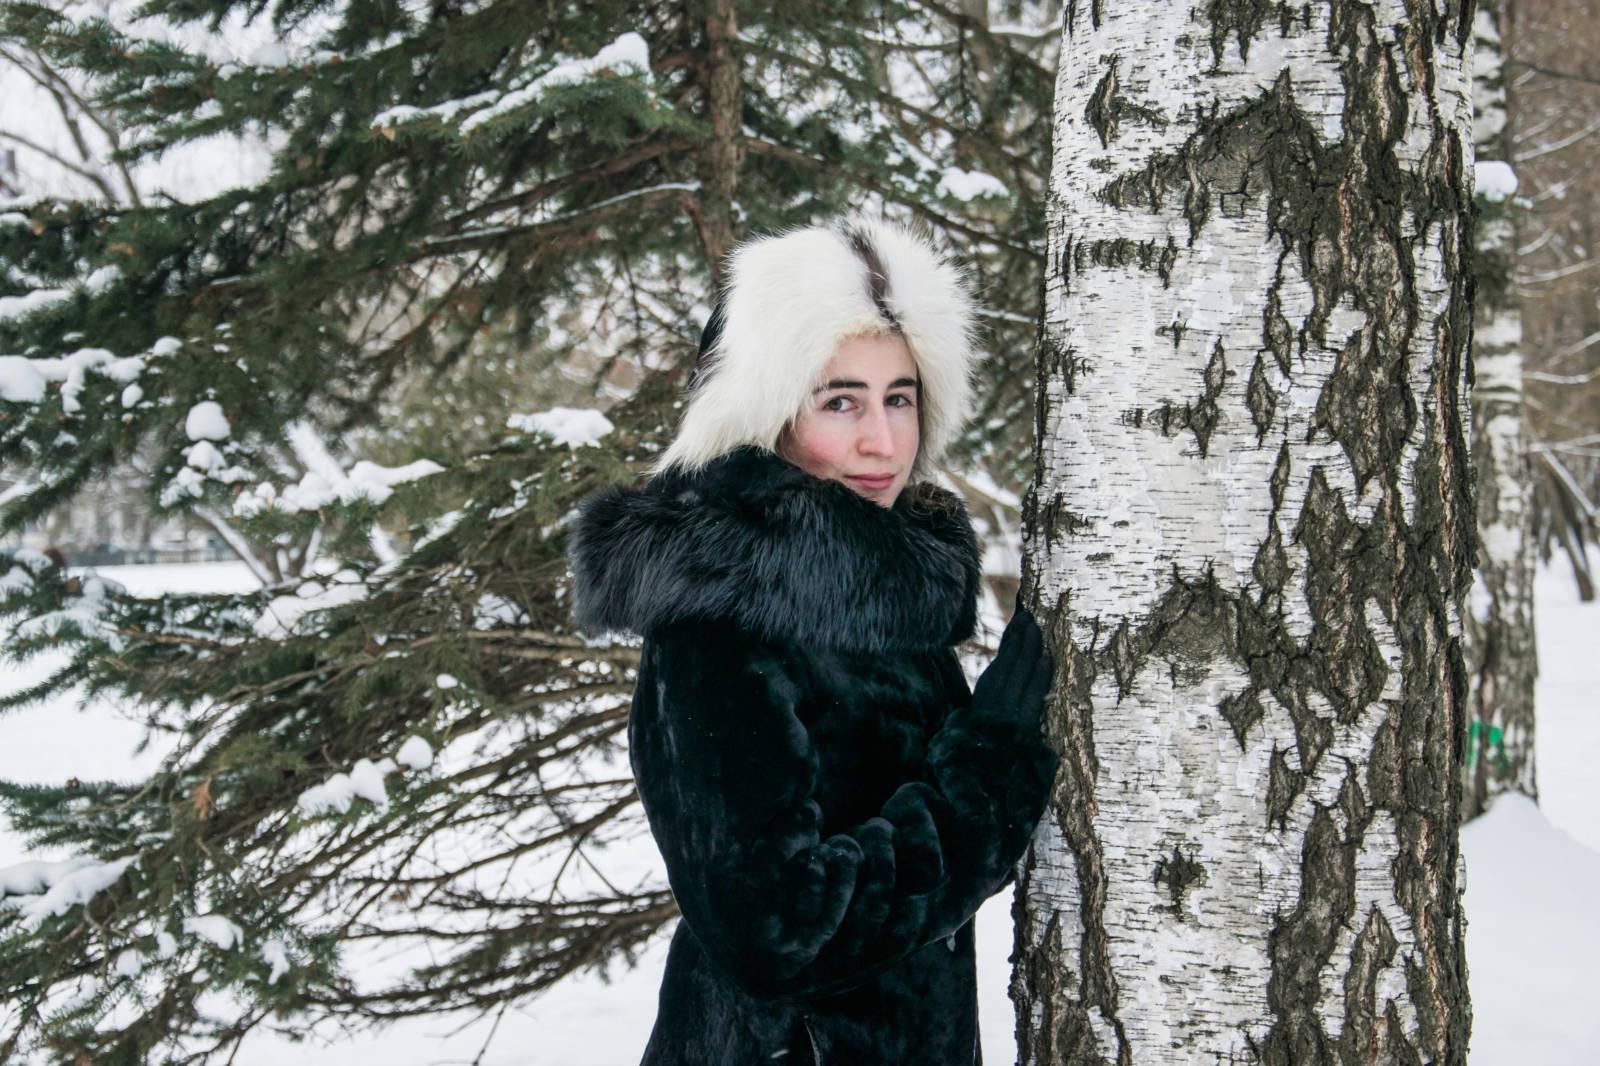 Portrait-Shooting-Elen-Ramirez-Photography